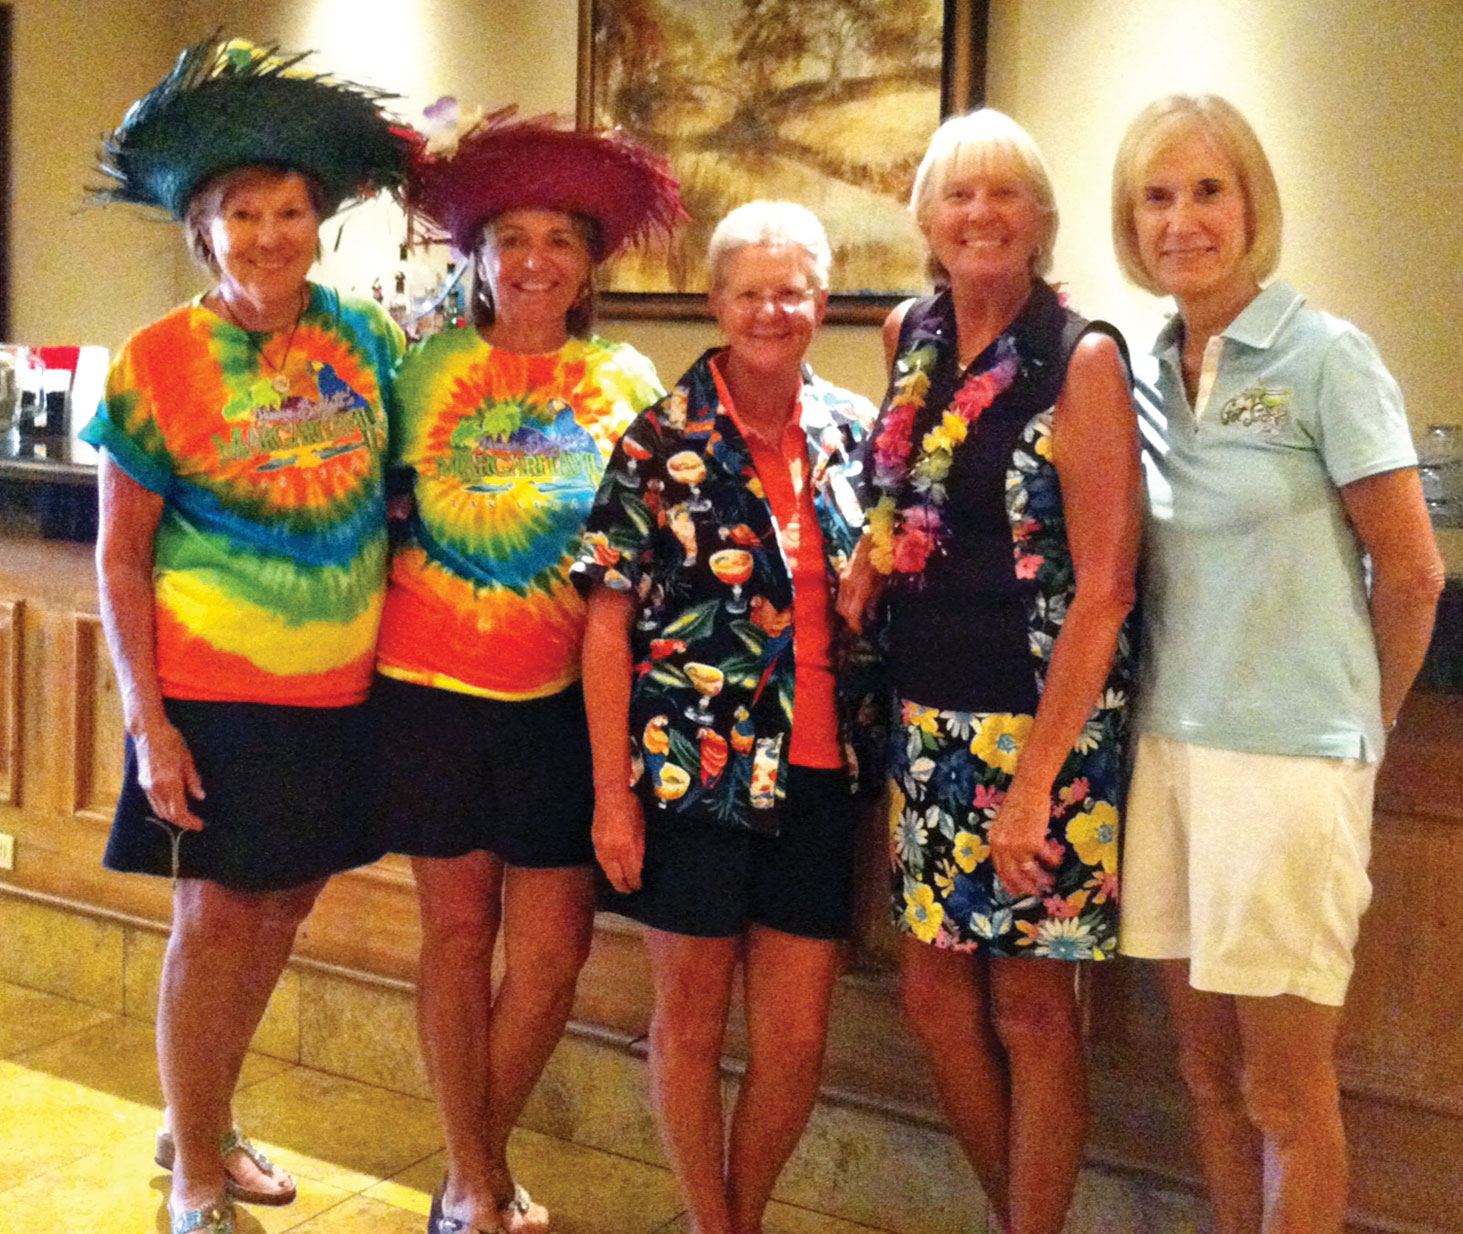 Left to right: Joanne Heiman, Layne Jones, Bobbie Johnson, Patty Bruchez and Robin Barber.